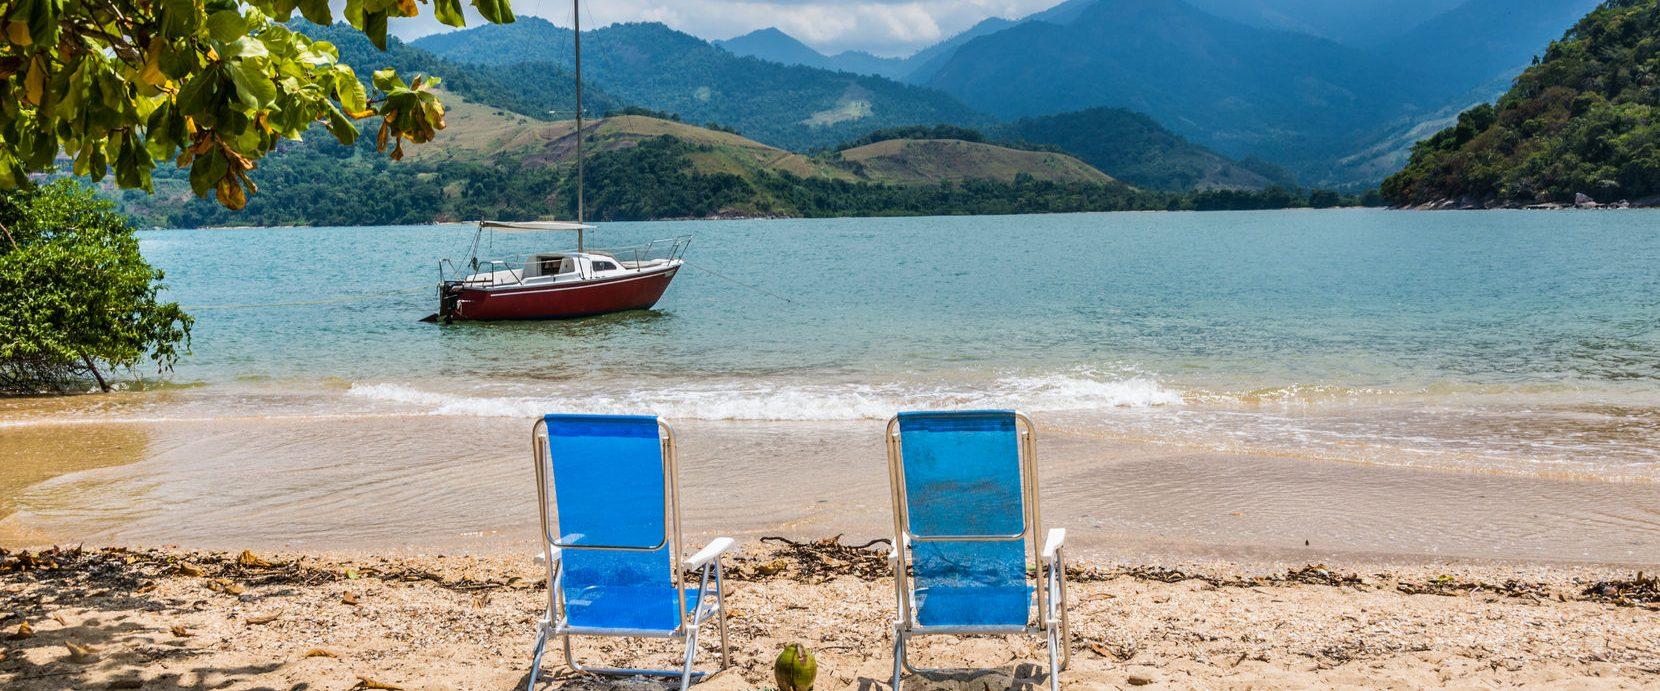 The coasta verde beach, looking out onto the mountainous region.